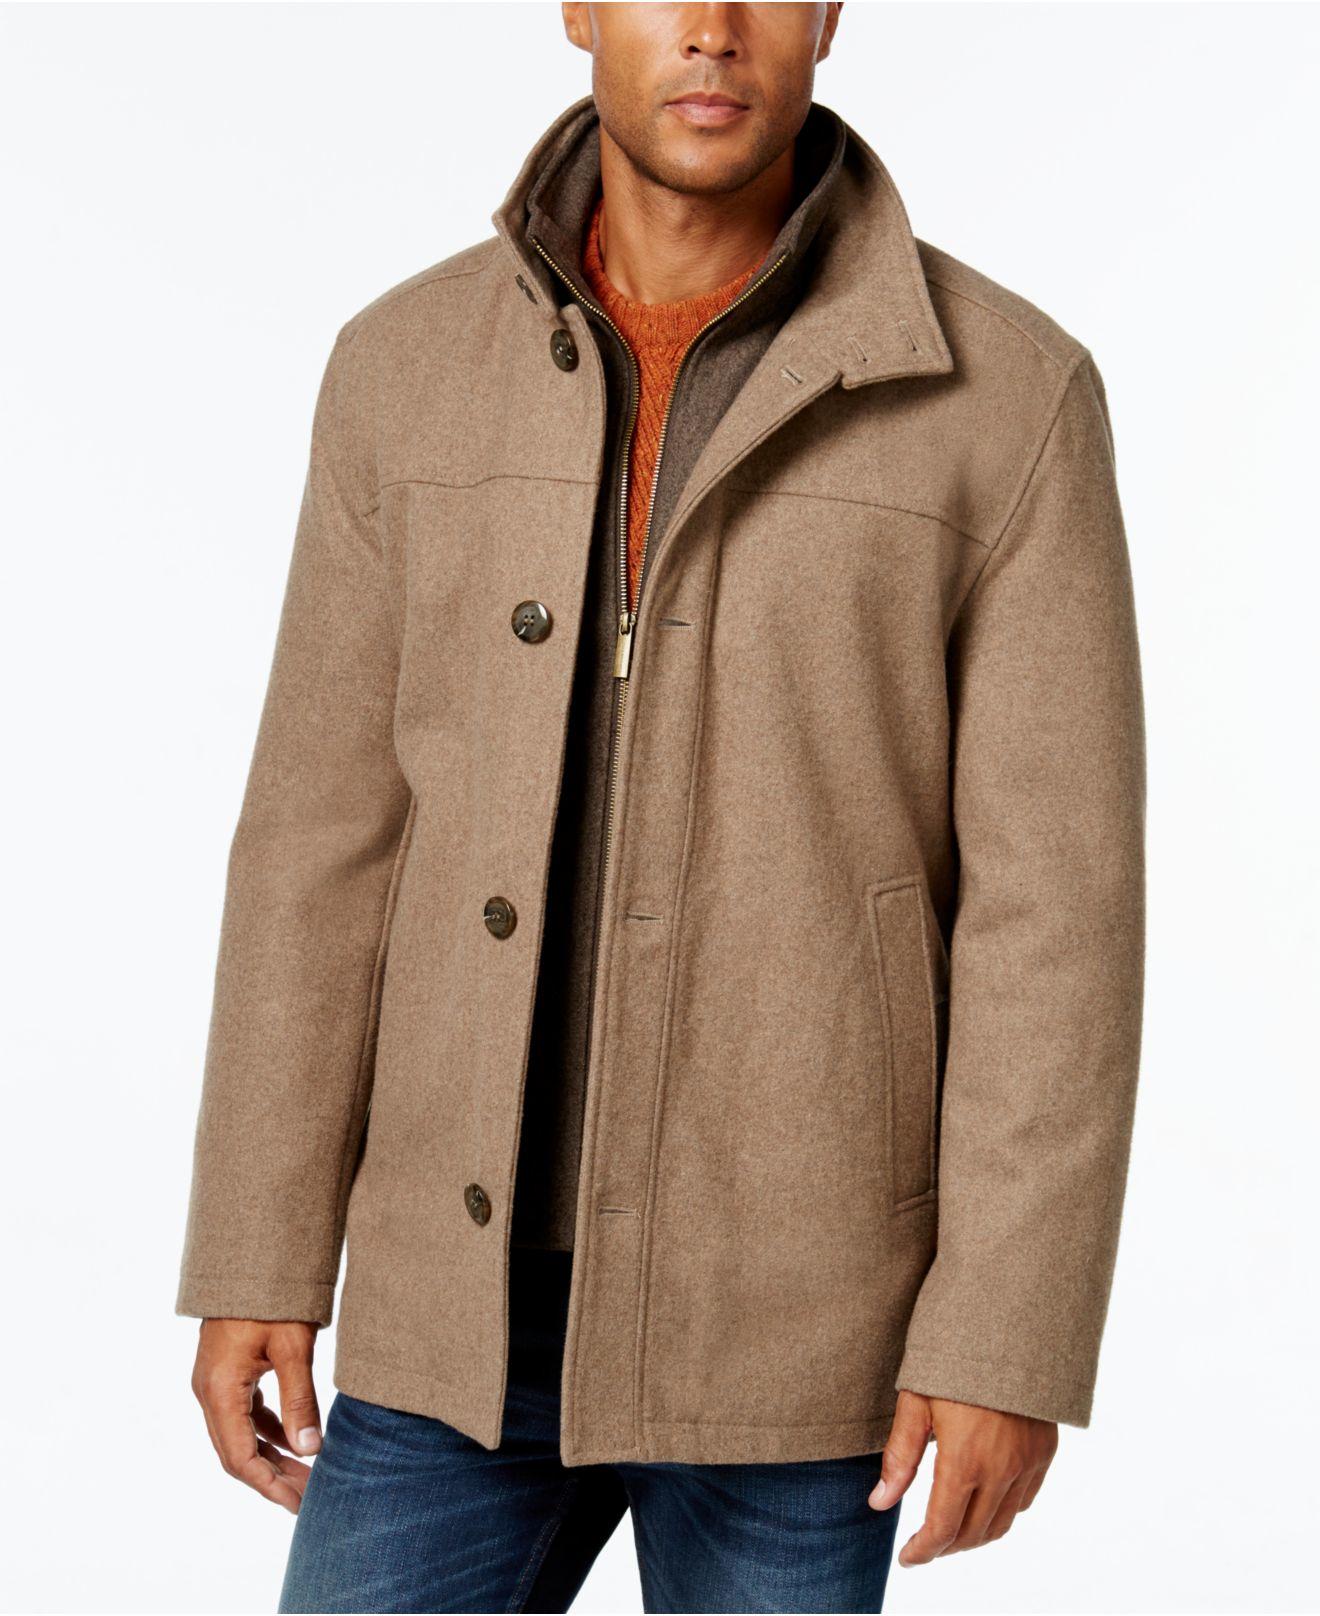 Leather Jacket Macys